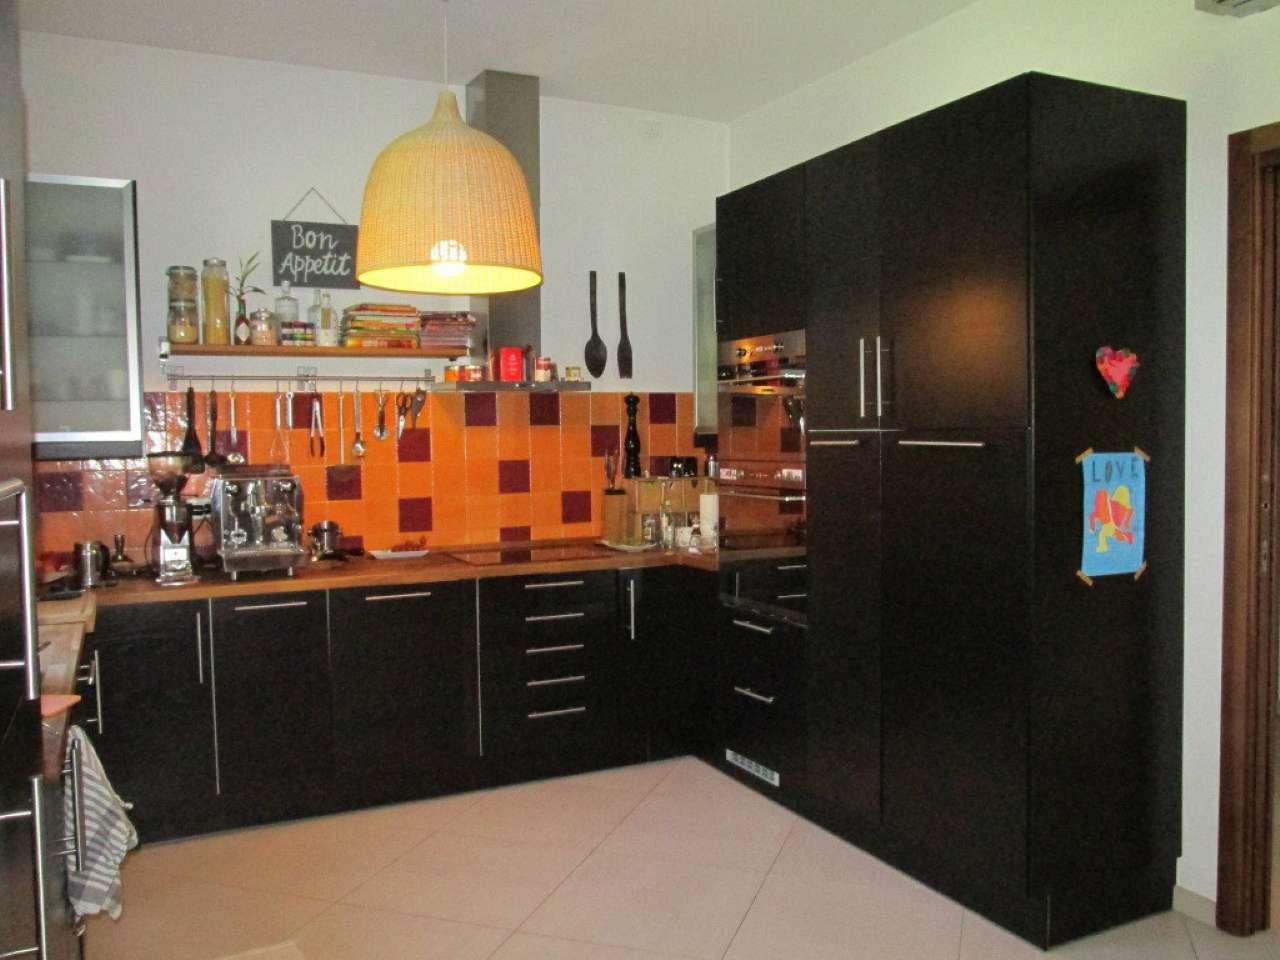 Villa in Vendita a Segrate: 5 locali, 300 mq - Foto 6